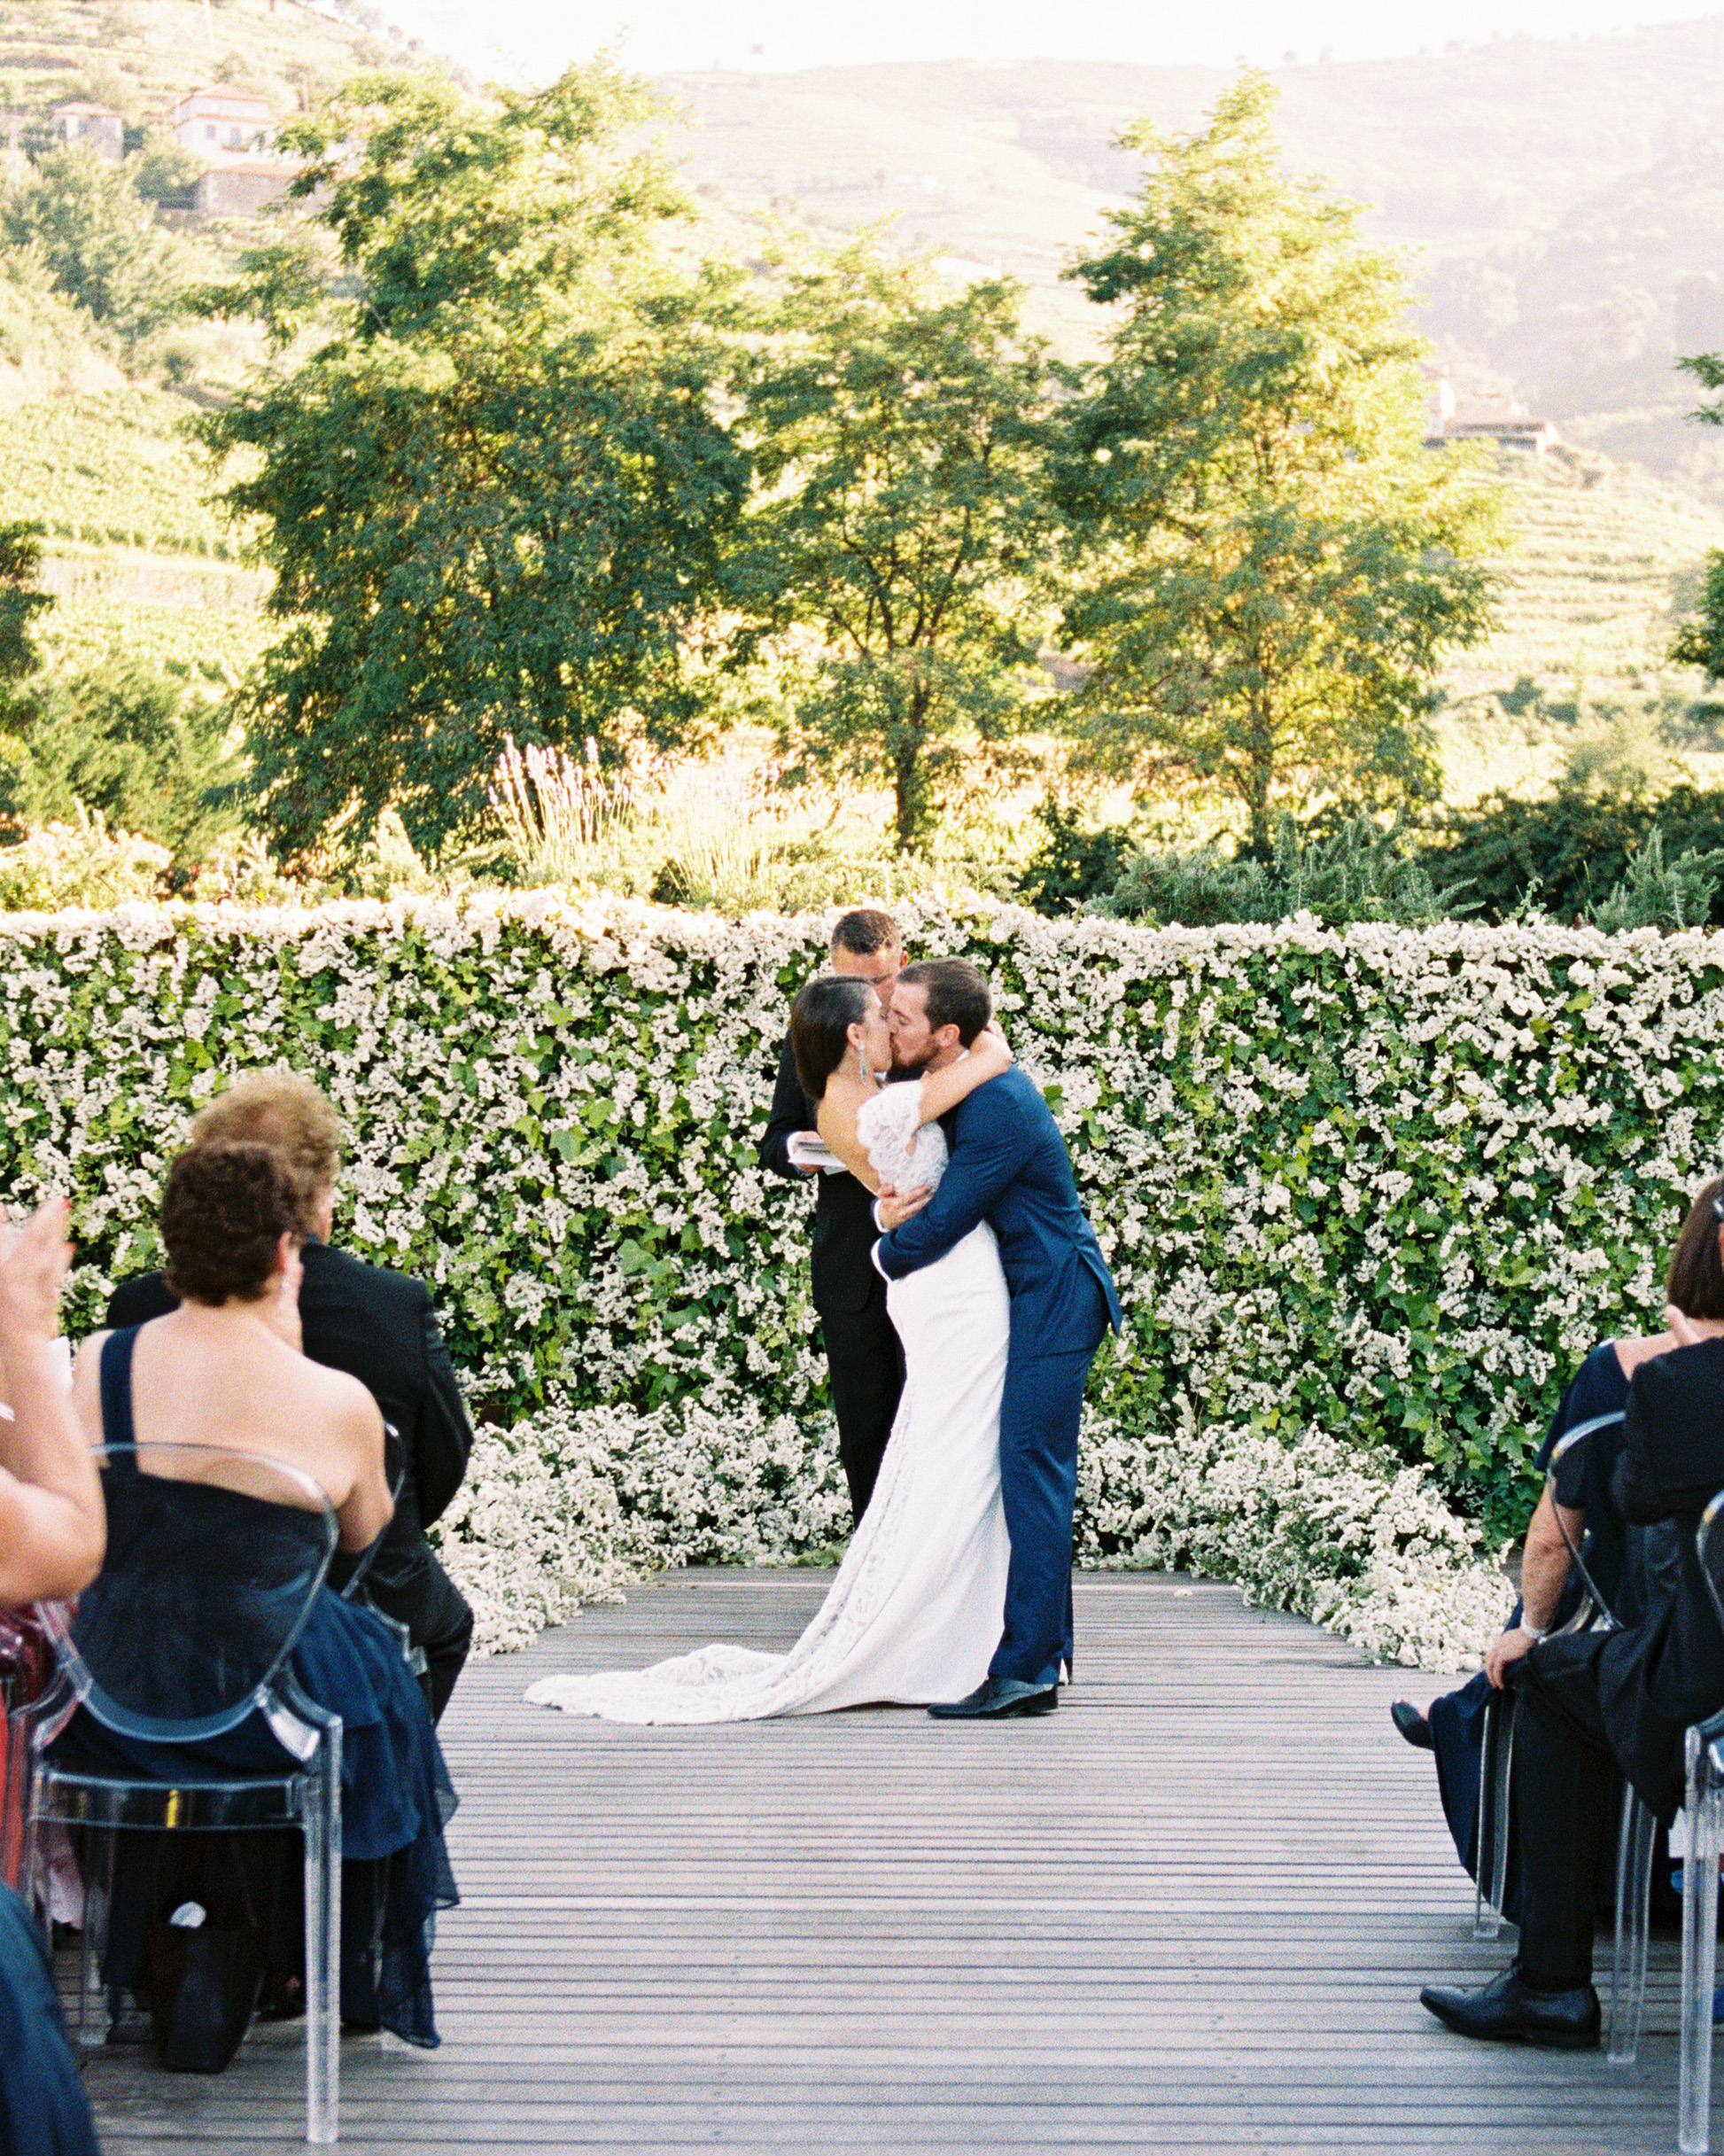 jeannette taylor wedding portugal ceremony